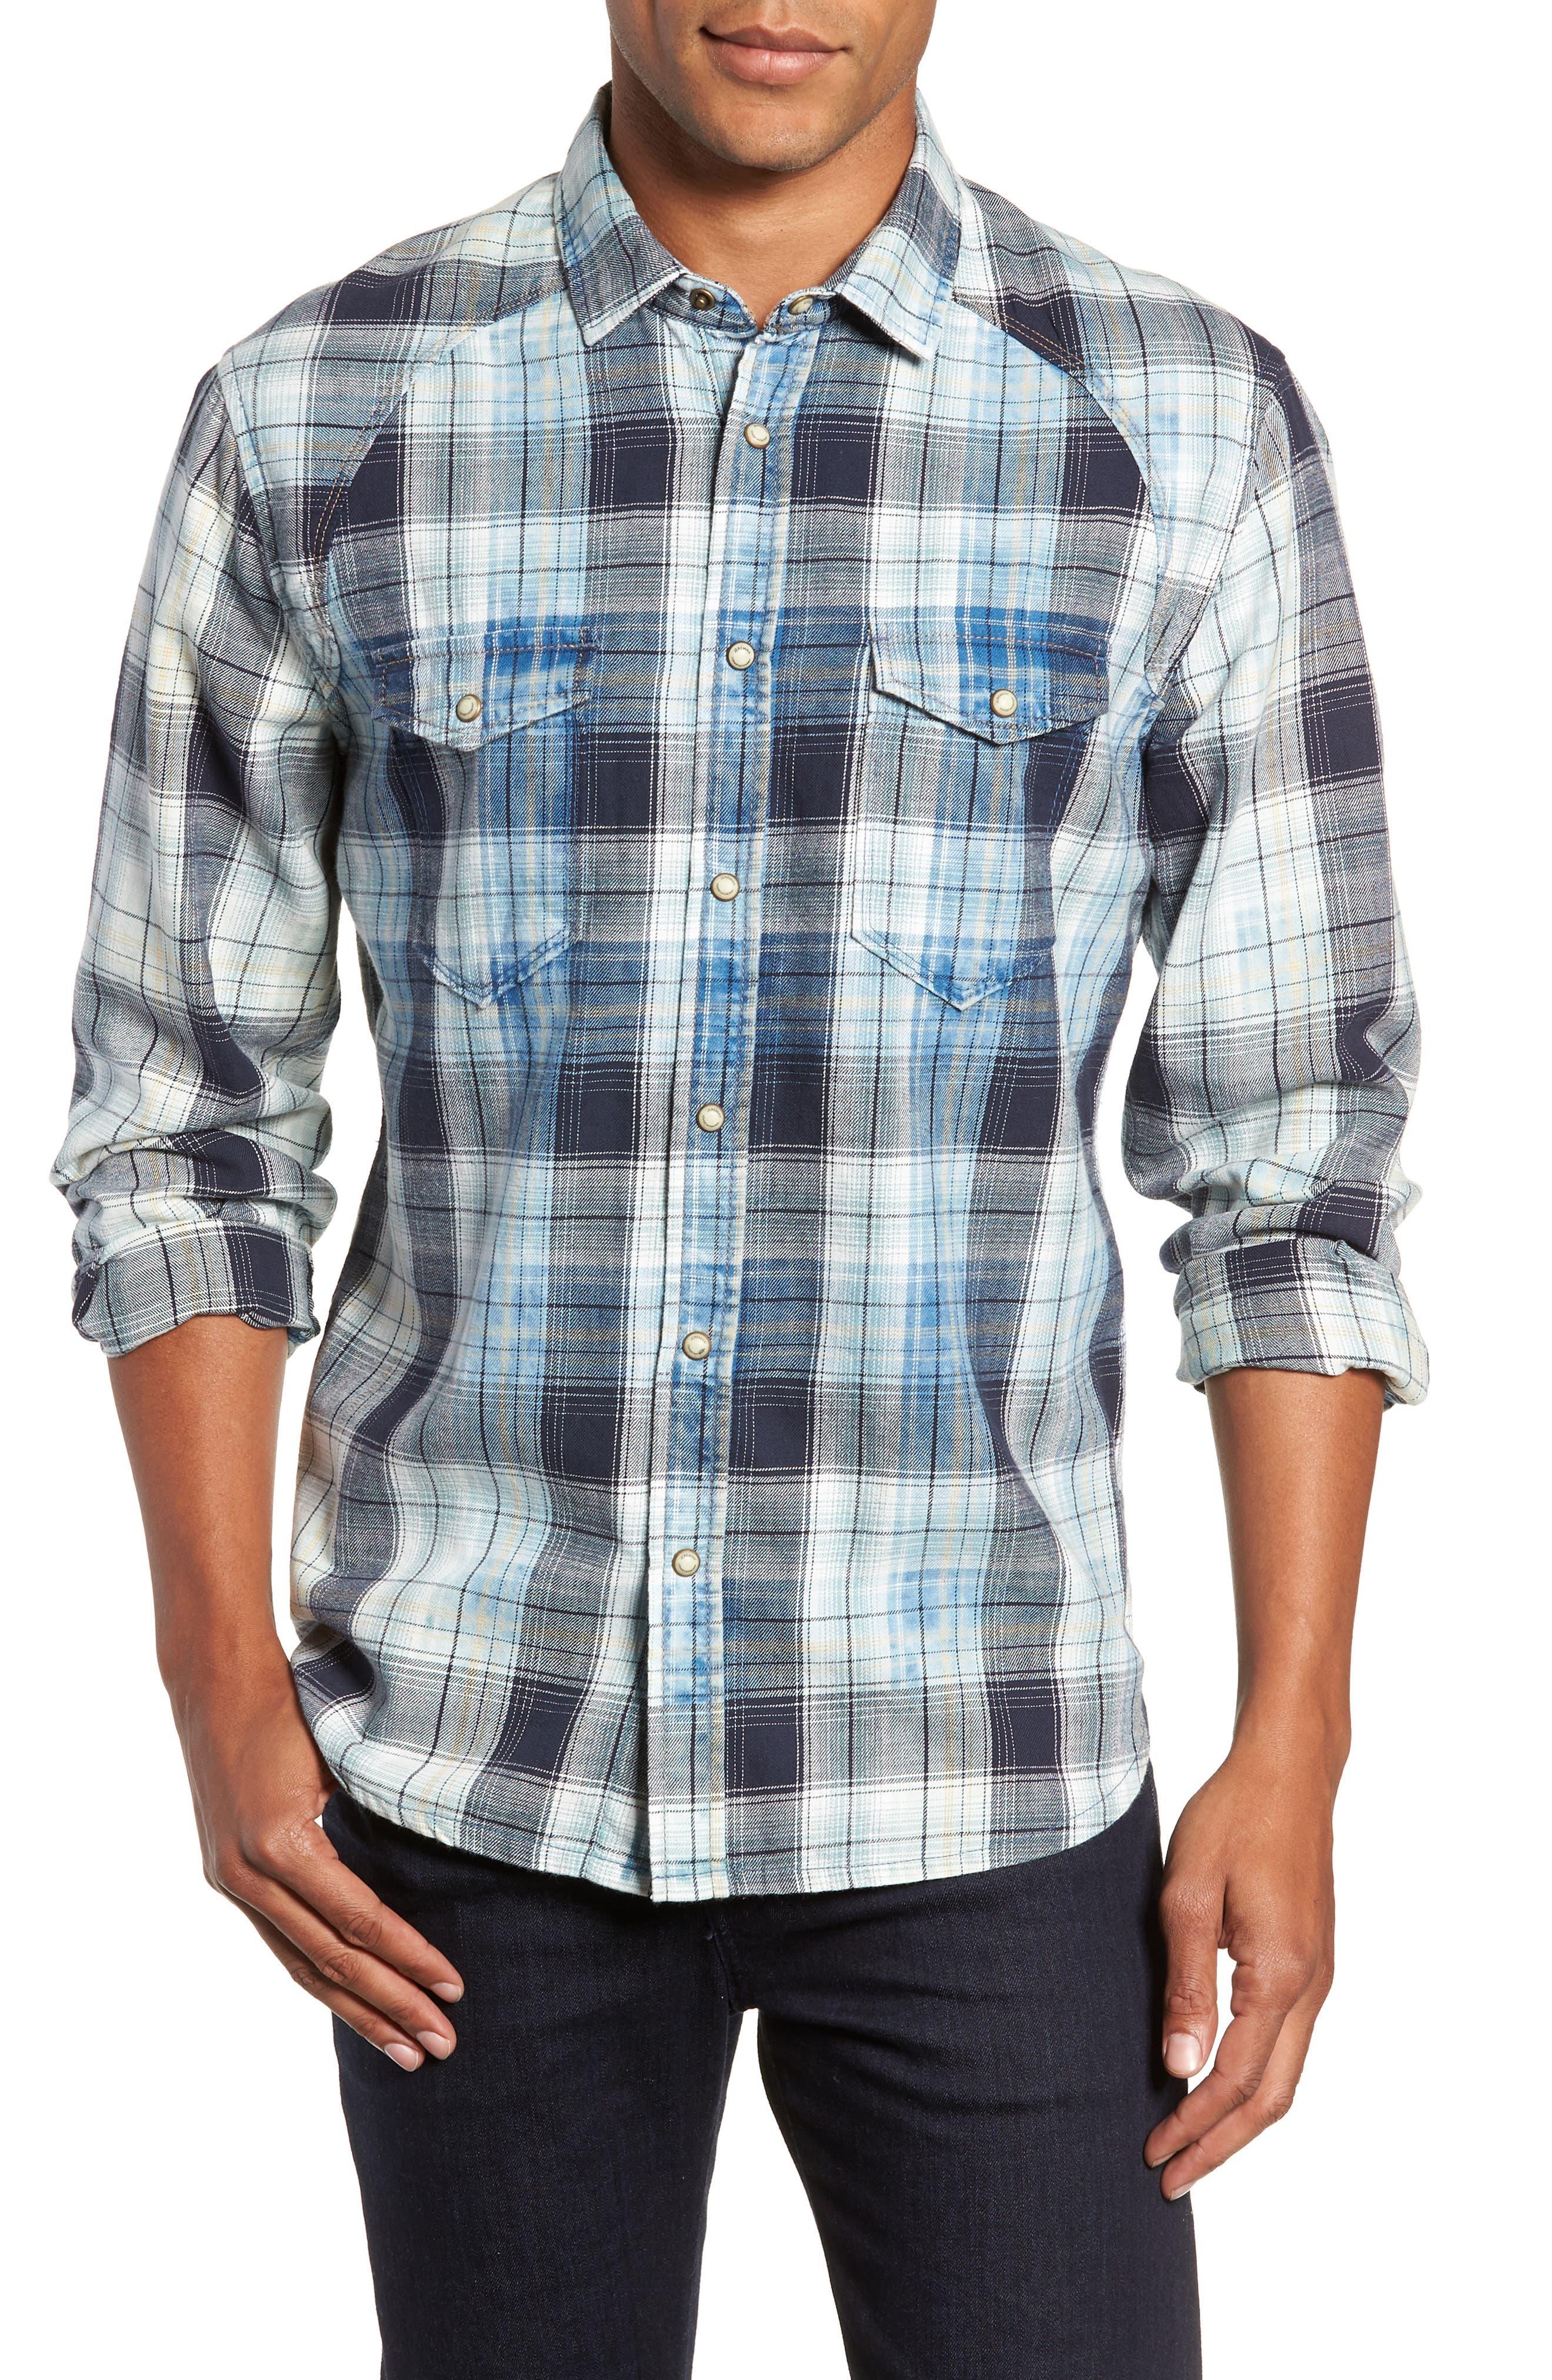 Sawtooth Regular Fit Crosshatch Plaid Shirt,                         Main,                         color, ENSIGN BLUE